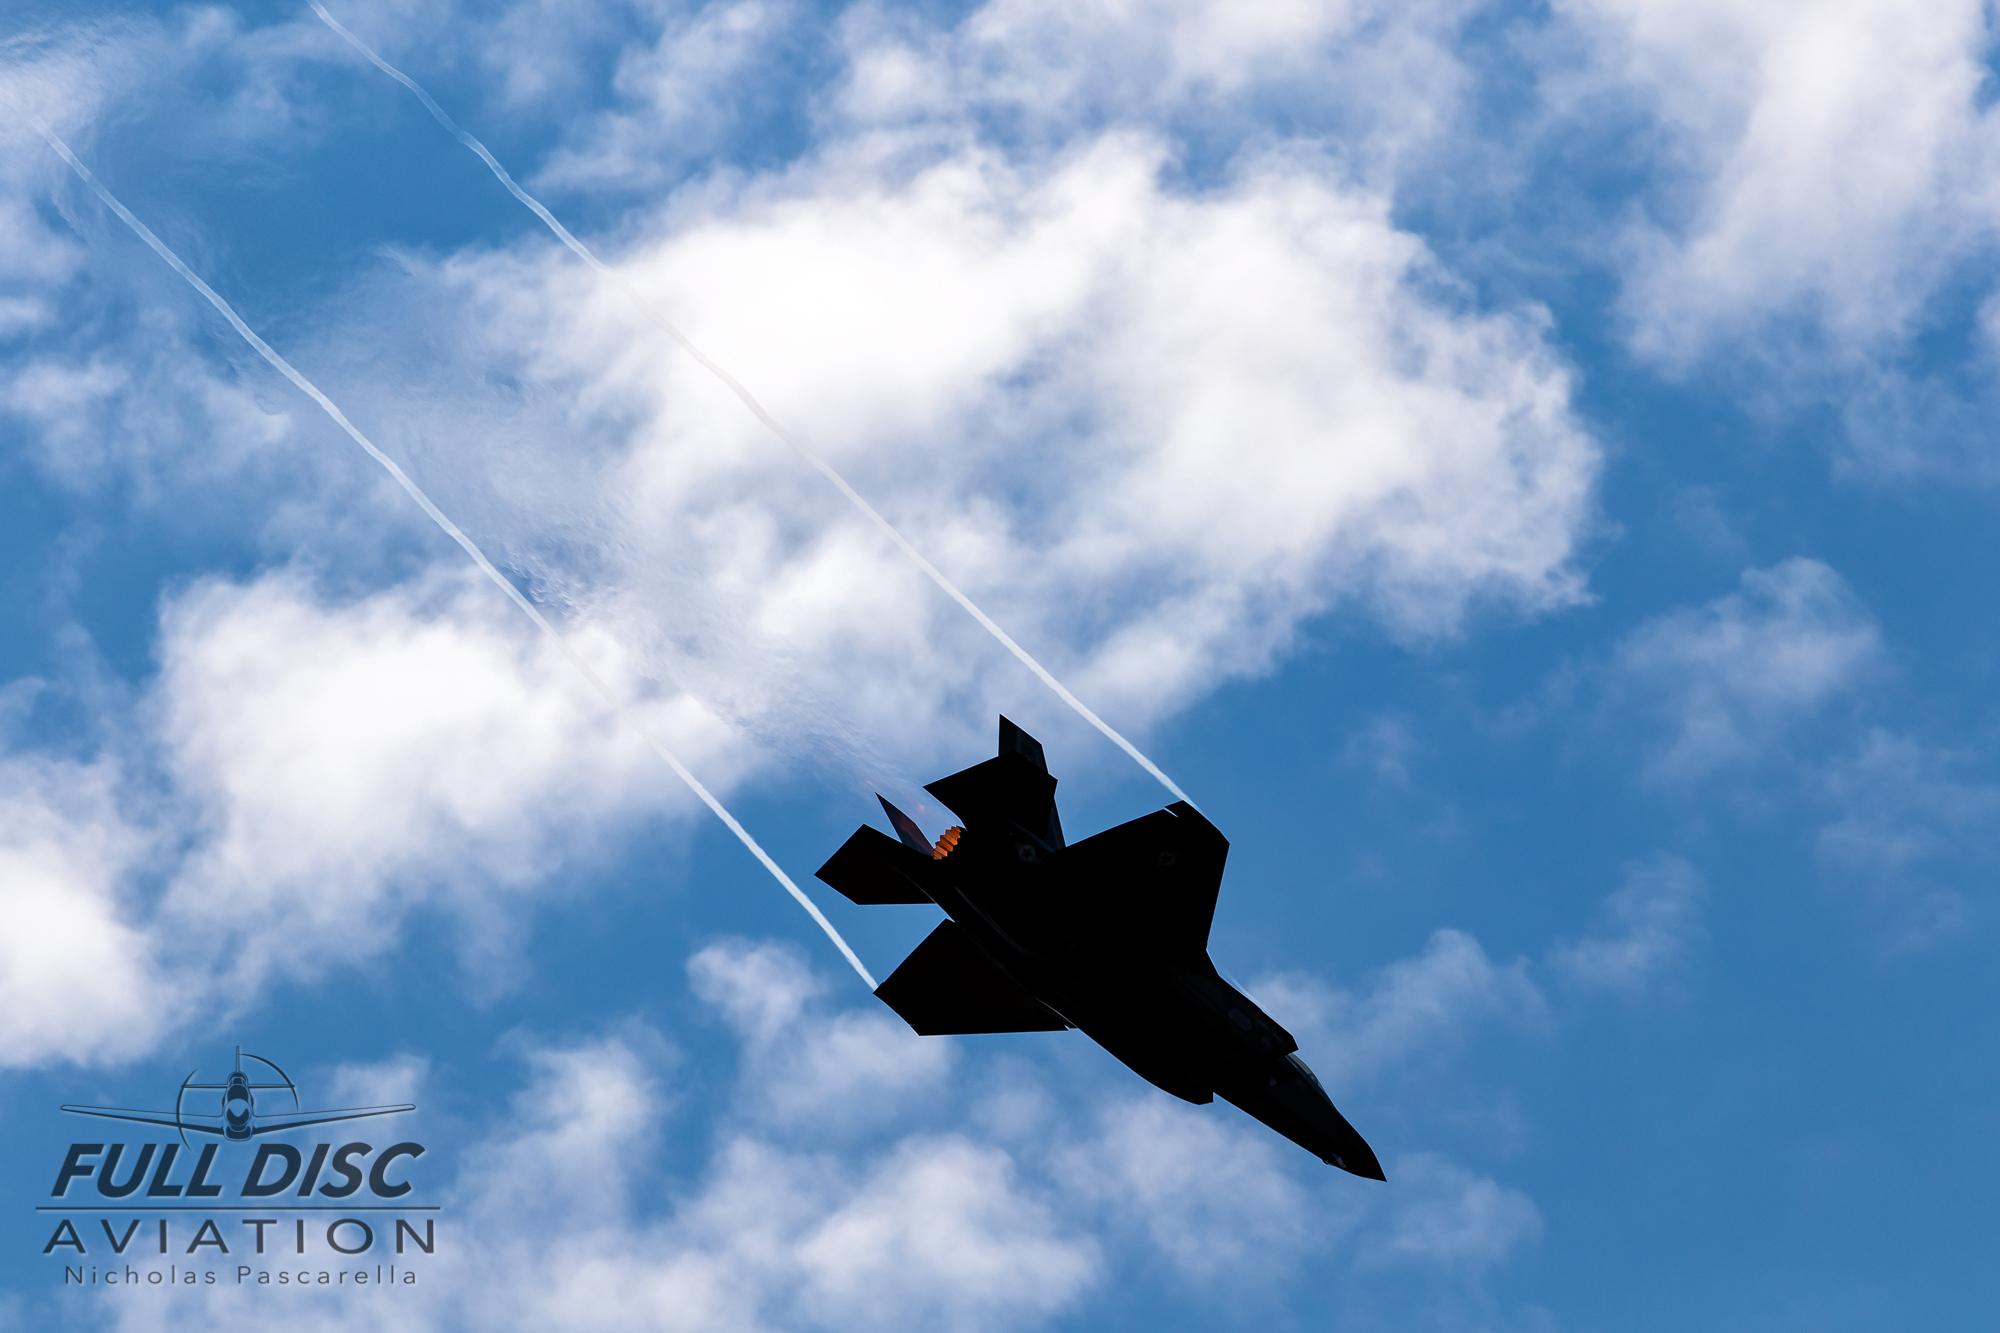 f35_pullingout_vapor_jelly_nickpascarella_fulldiscaviation_.jpg